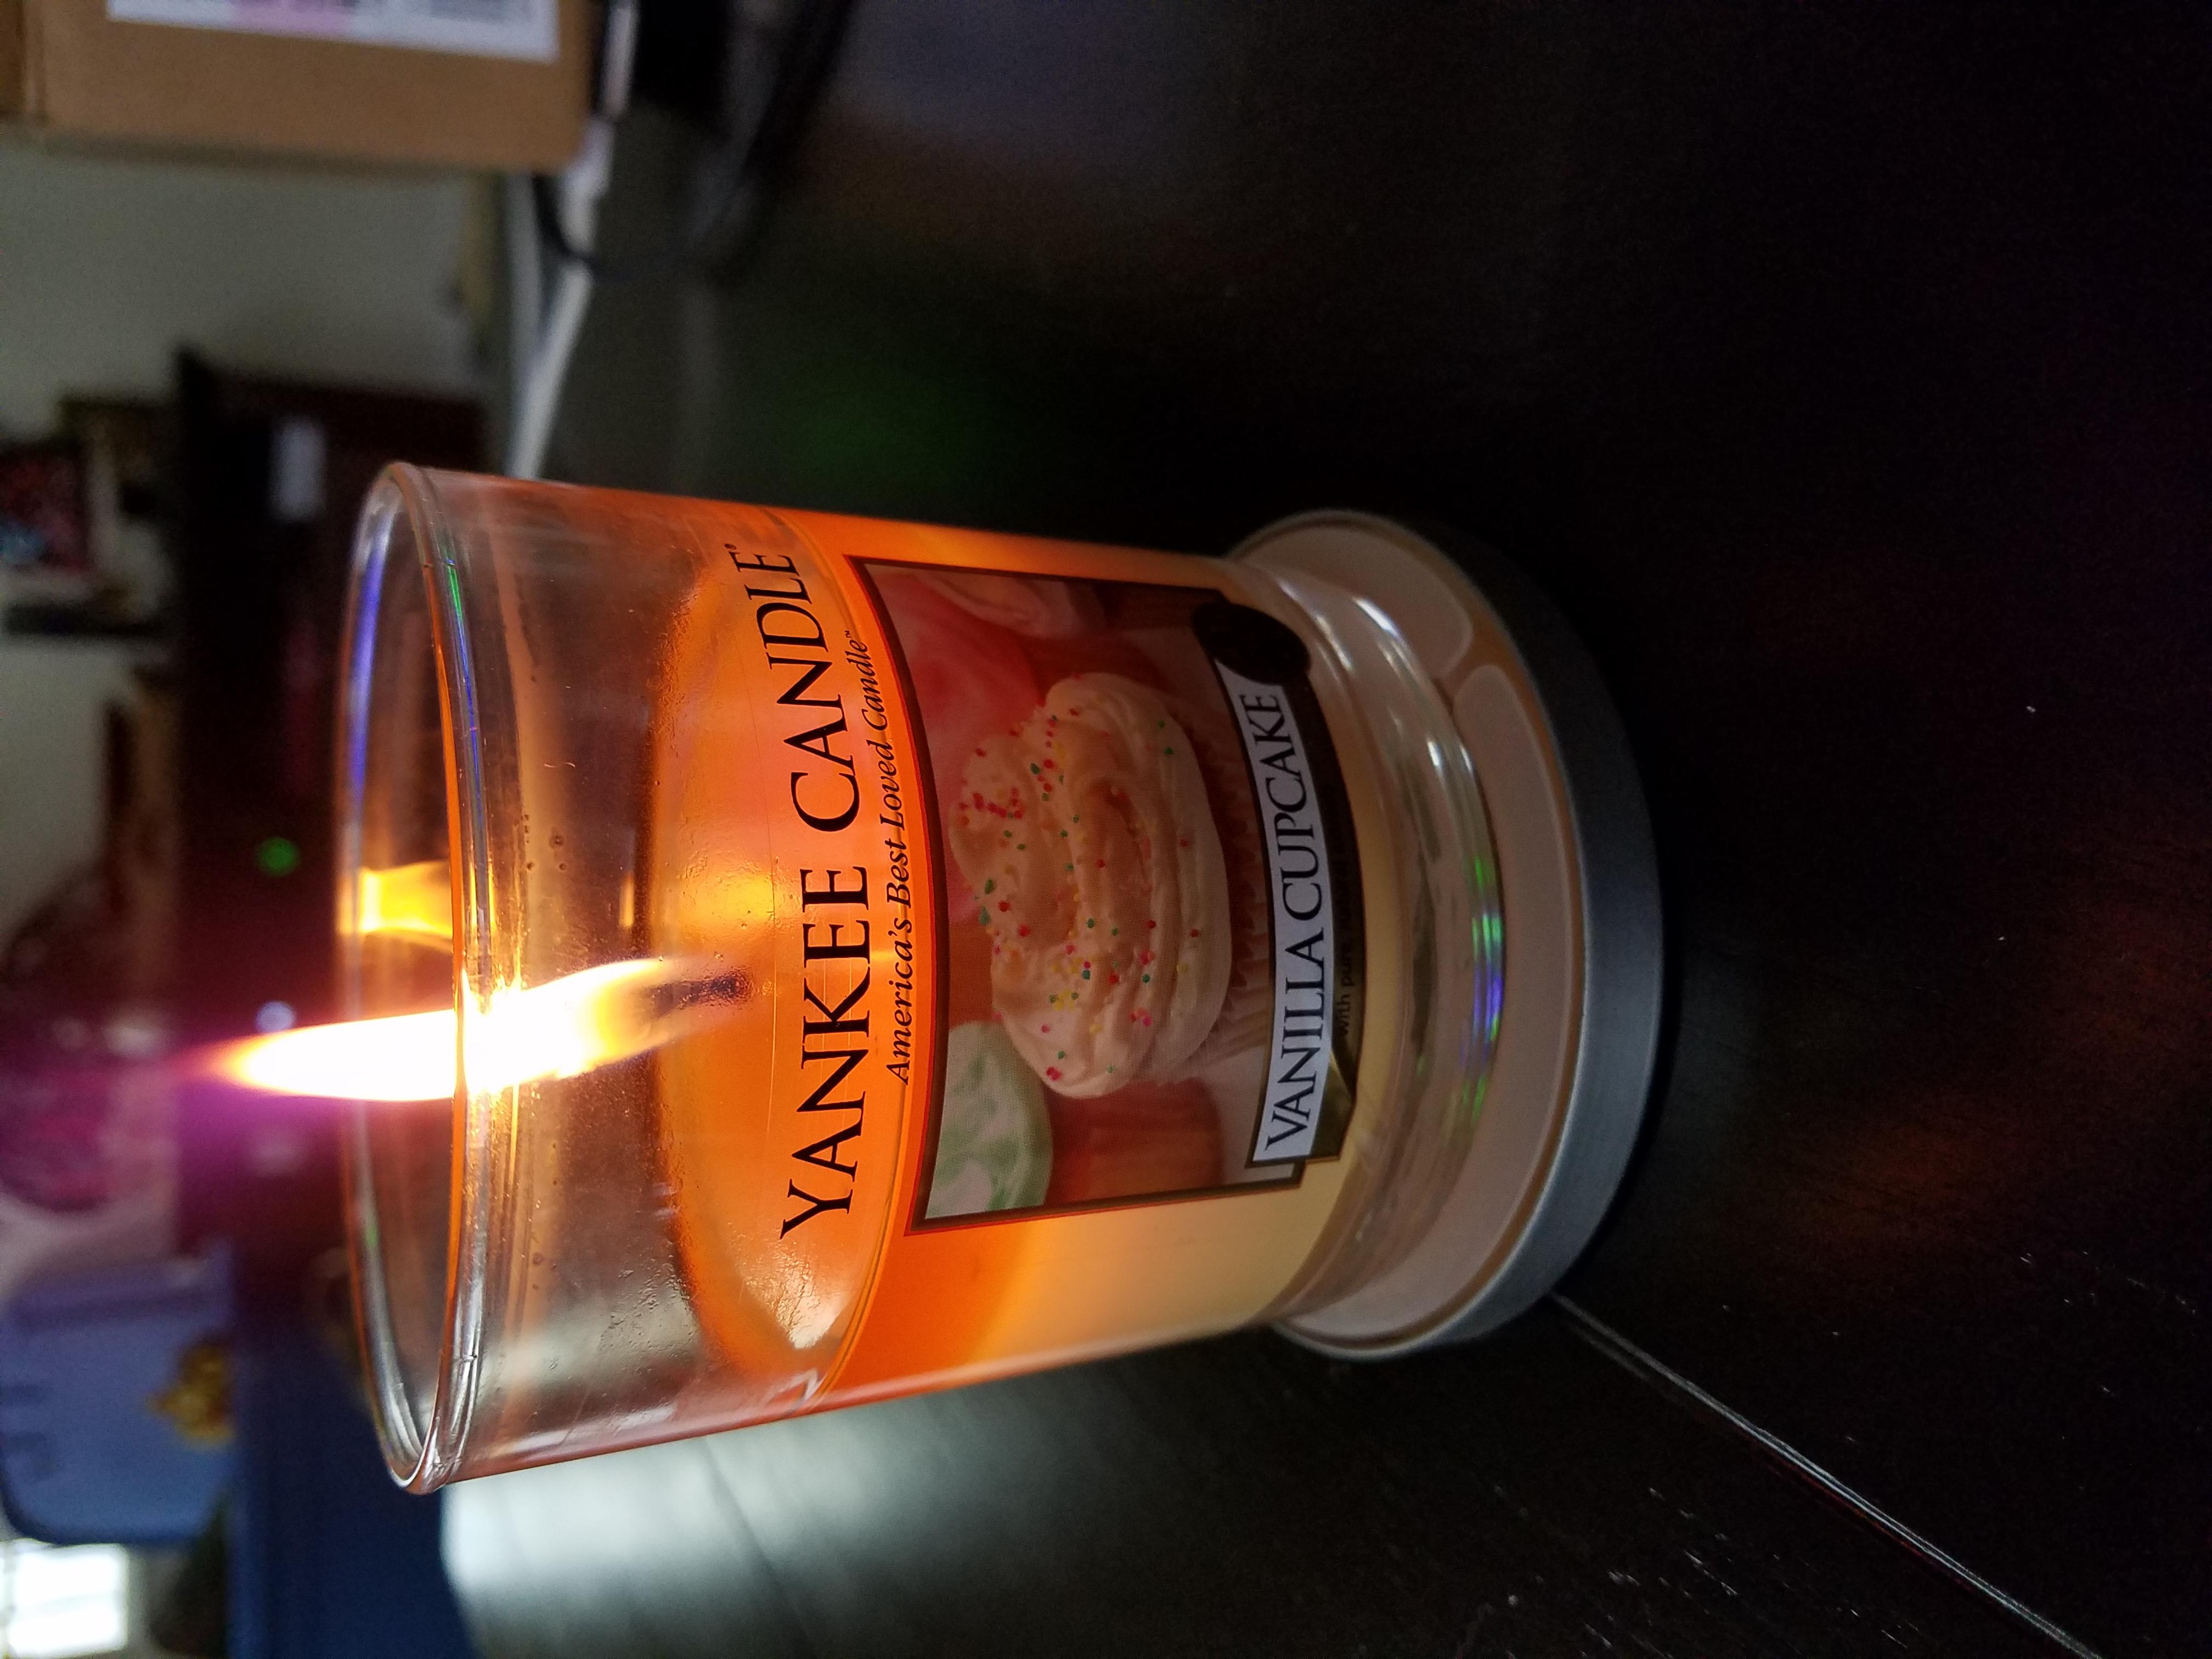 Yankee Candle Housewarmer Vanilla Cupcake Medium Lidded Candle Tumbler uploaded by Sammy Y.